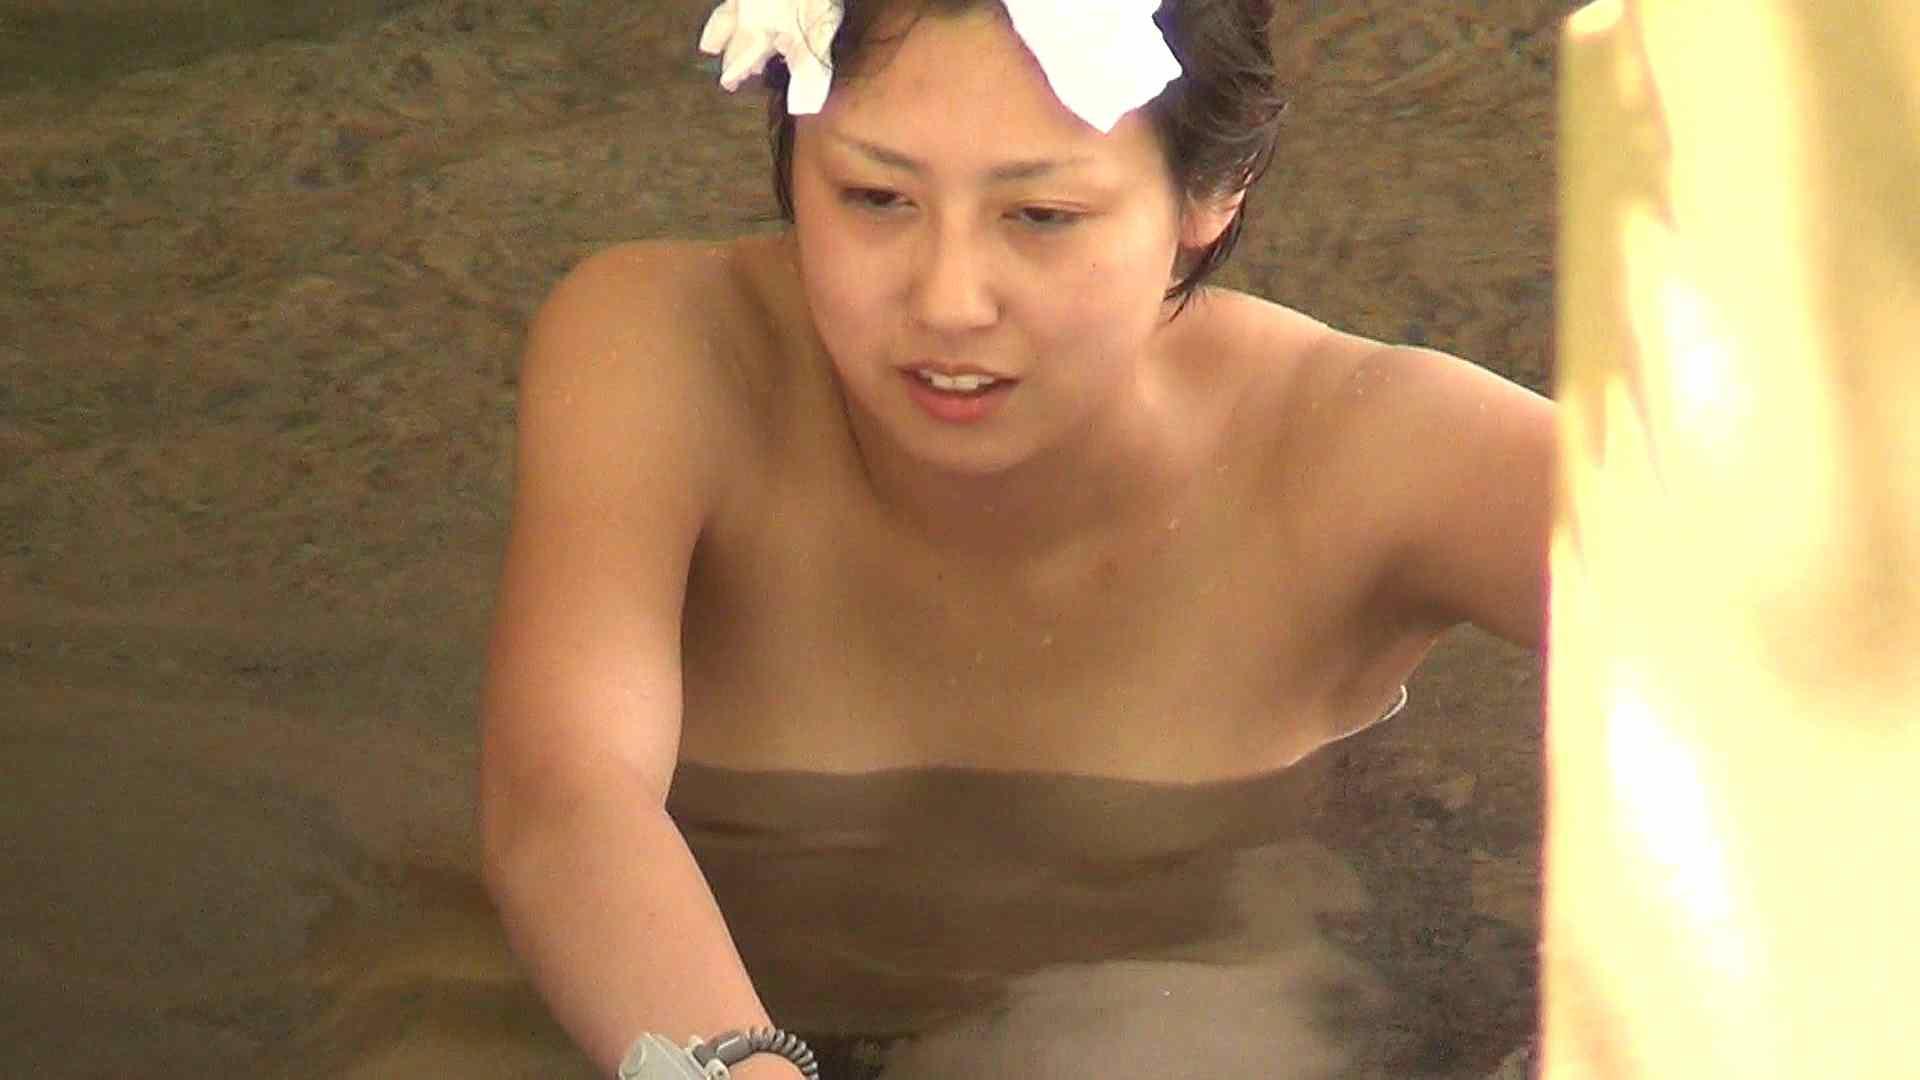 Aquaな露天風呂Vol.243 盗撮 アダルト動画キャプチャ 57連発 38